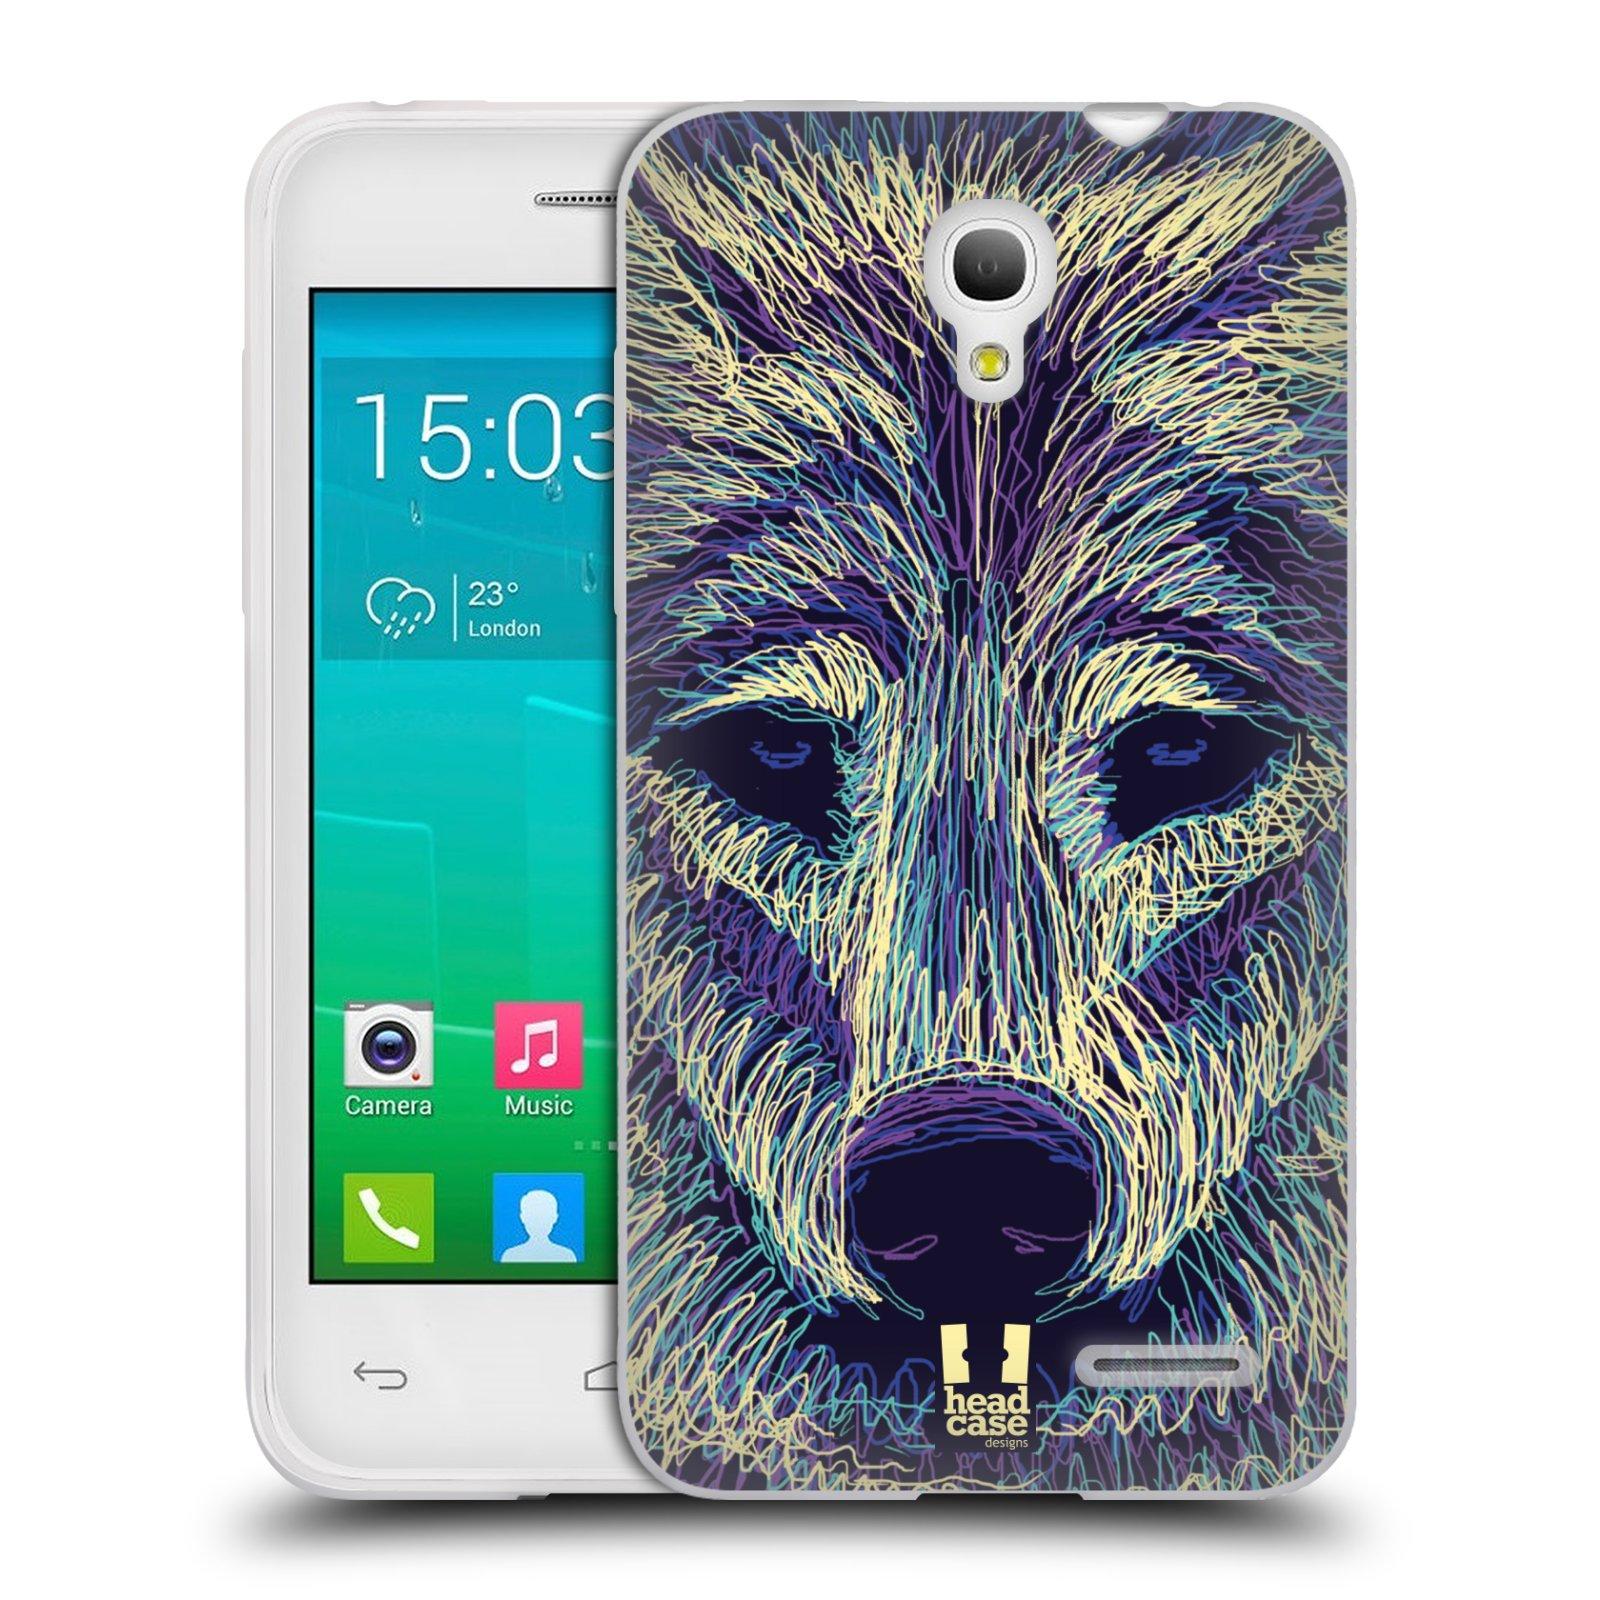 HEAD CASE silikonový obal na mobil Alcatel POP S3 OT-5050Y vzor zvíře čmáranice vlk